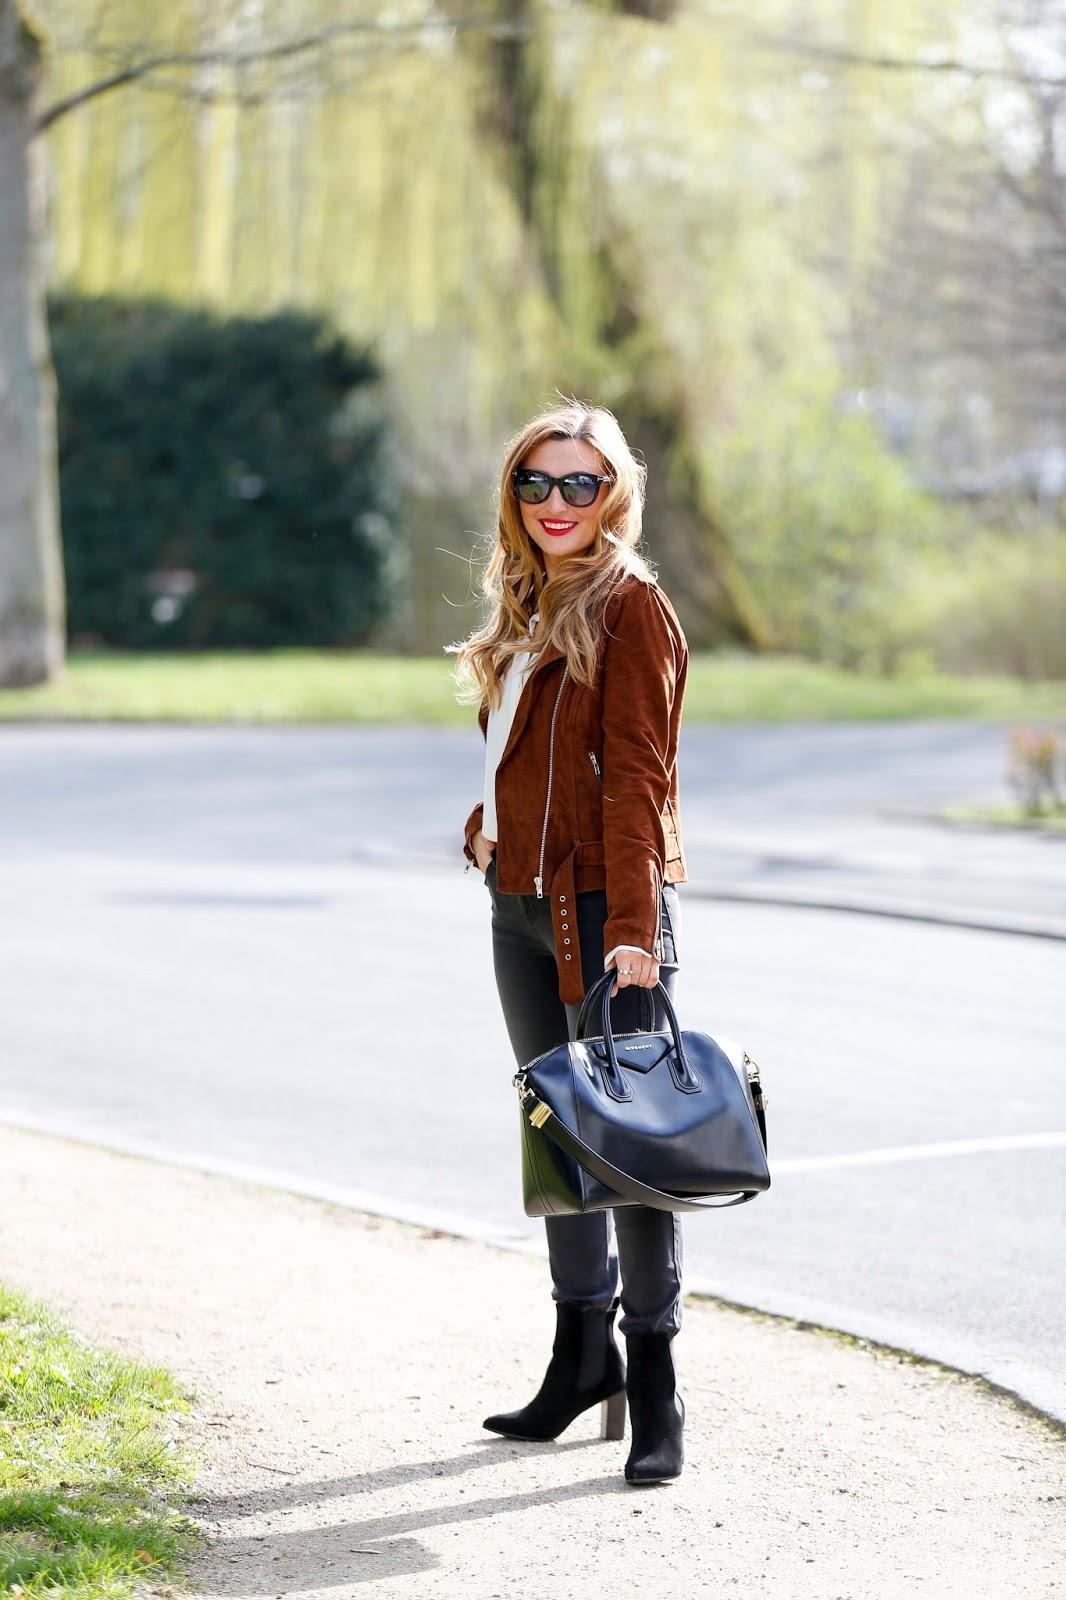 Deutsche-fashionblogger-fashionstylebyjohanna-bloggerin-aus-frankfurt-frankfurt-fashionblogger